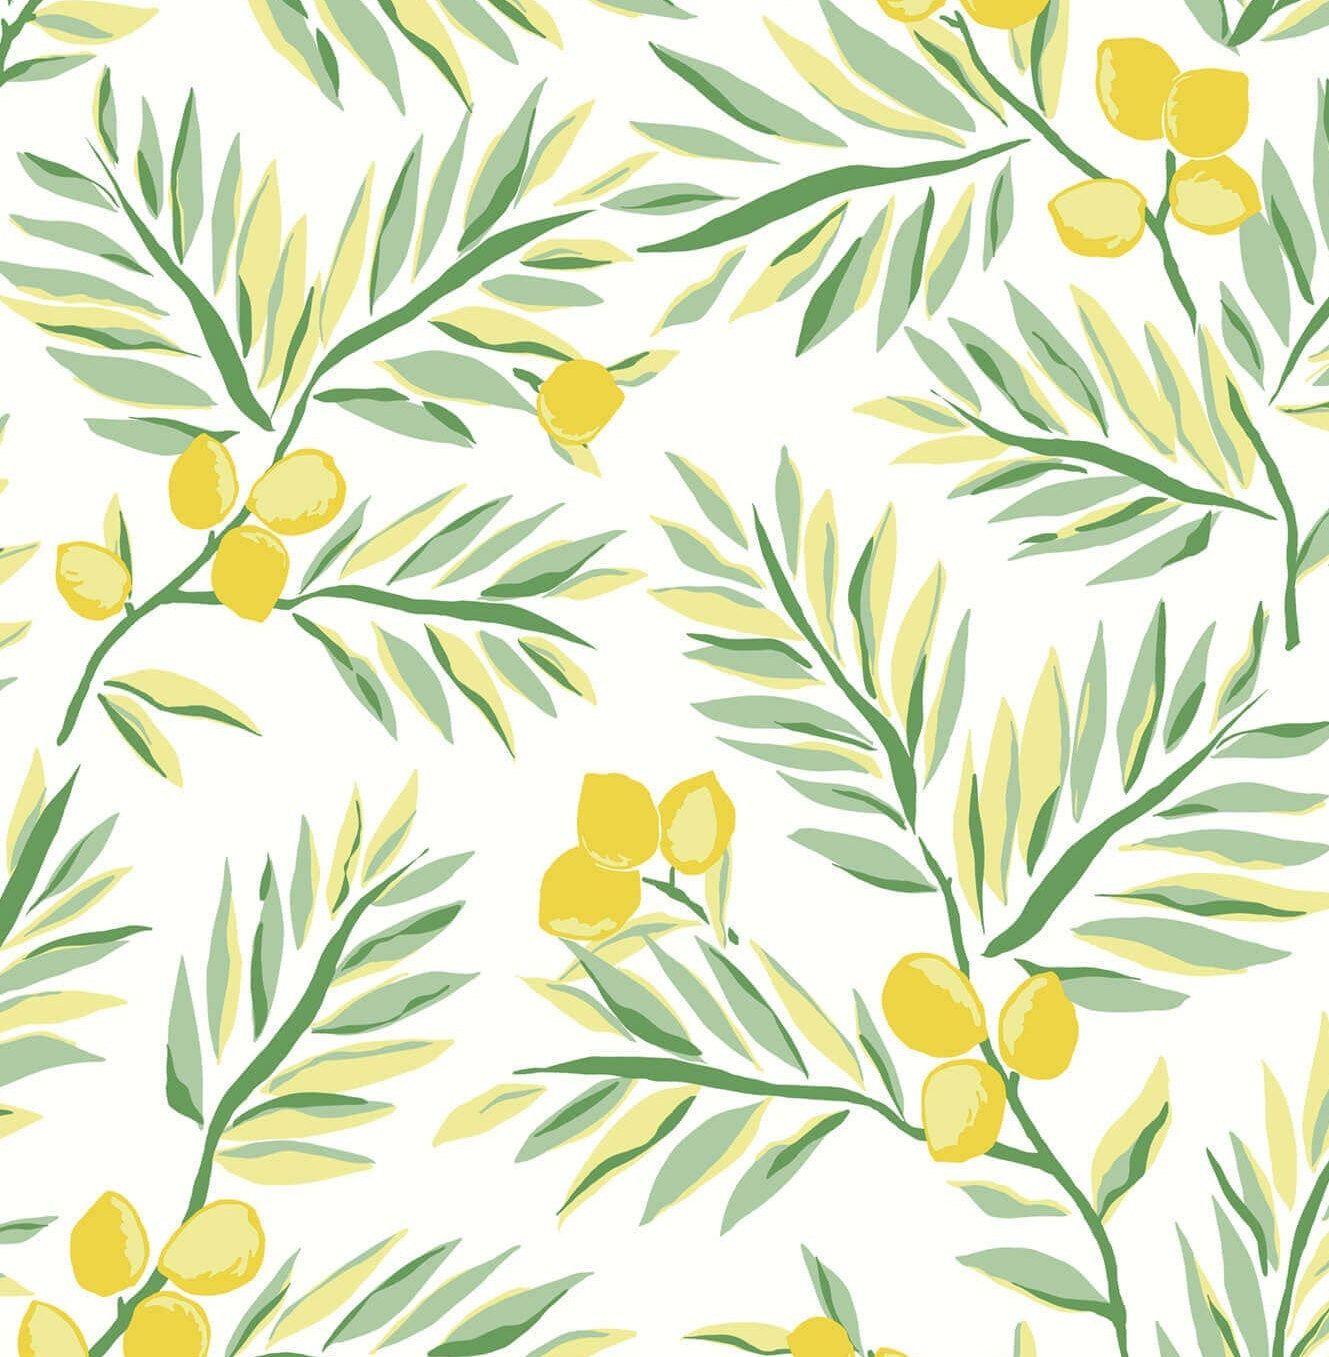 Peel And Stick Wallpaper Self Adhesive Wallpaper Lemon Etsy Peel And Stick Wallpaper Temporary Wallpaper Wallpaper Warehouse